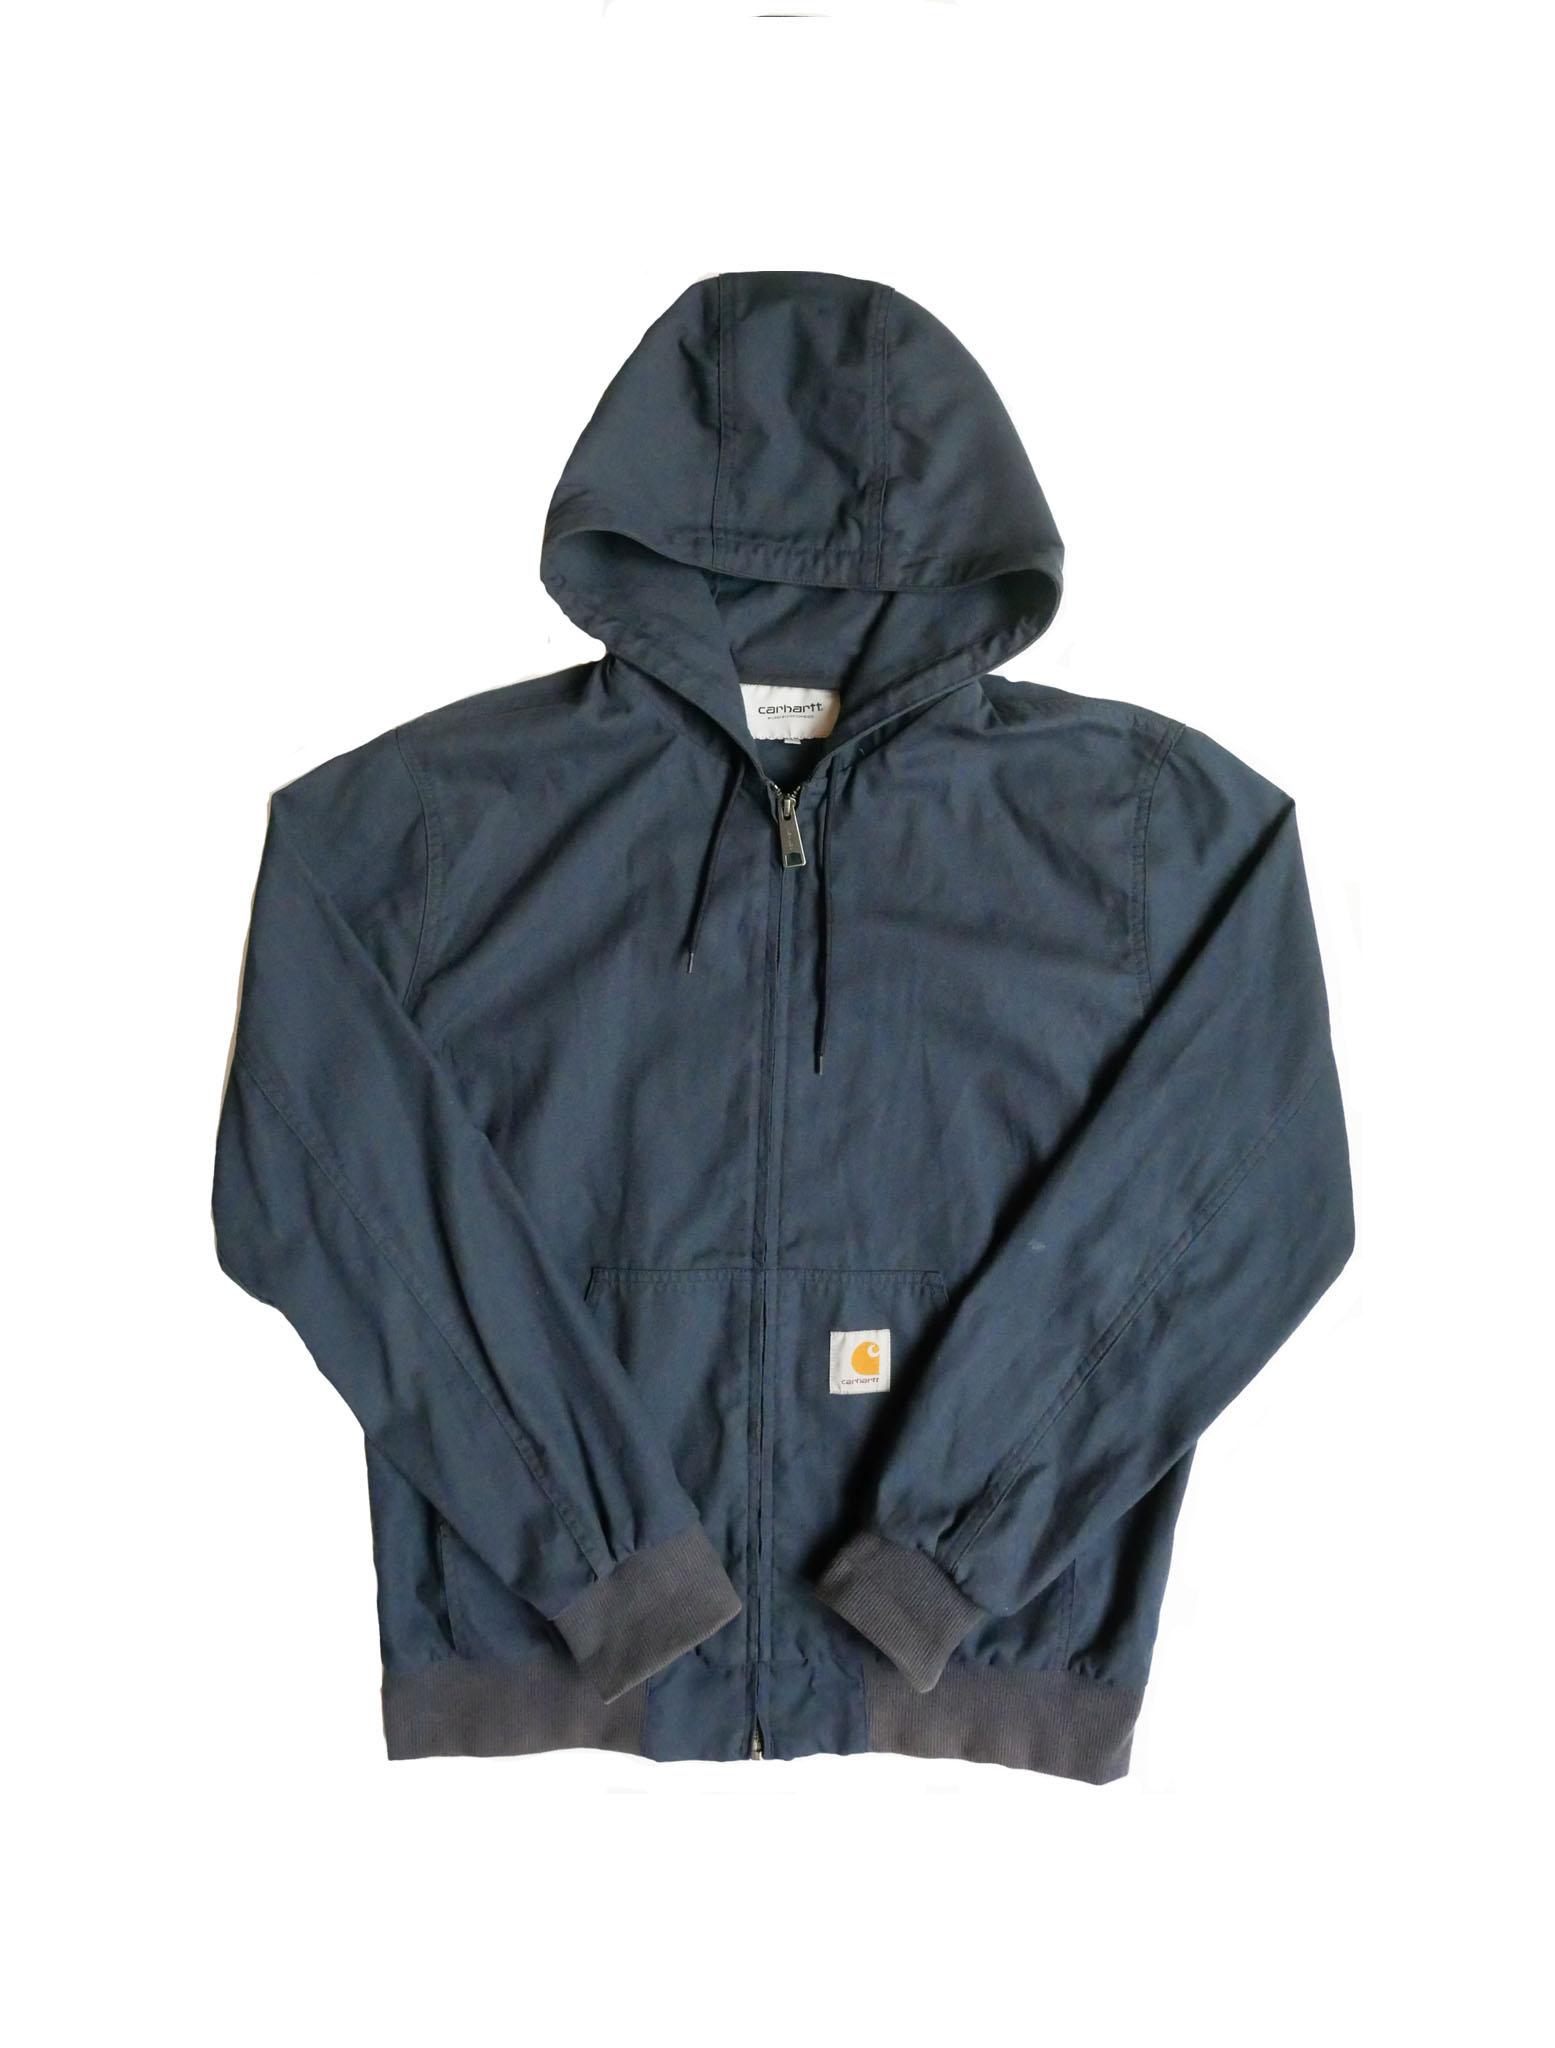 Carhartt WIP Jacket